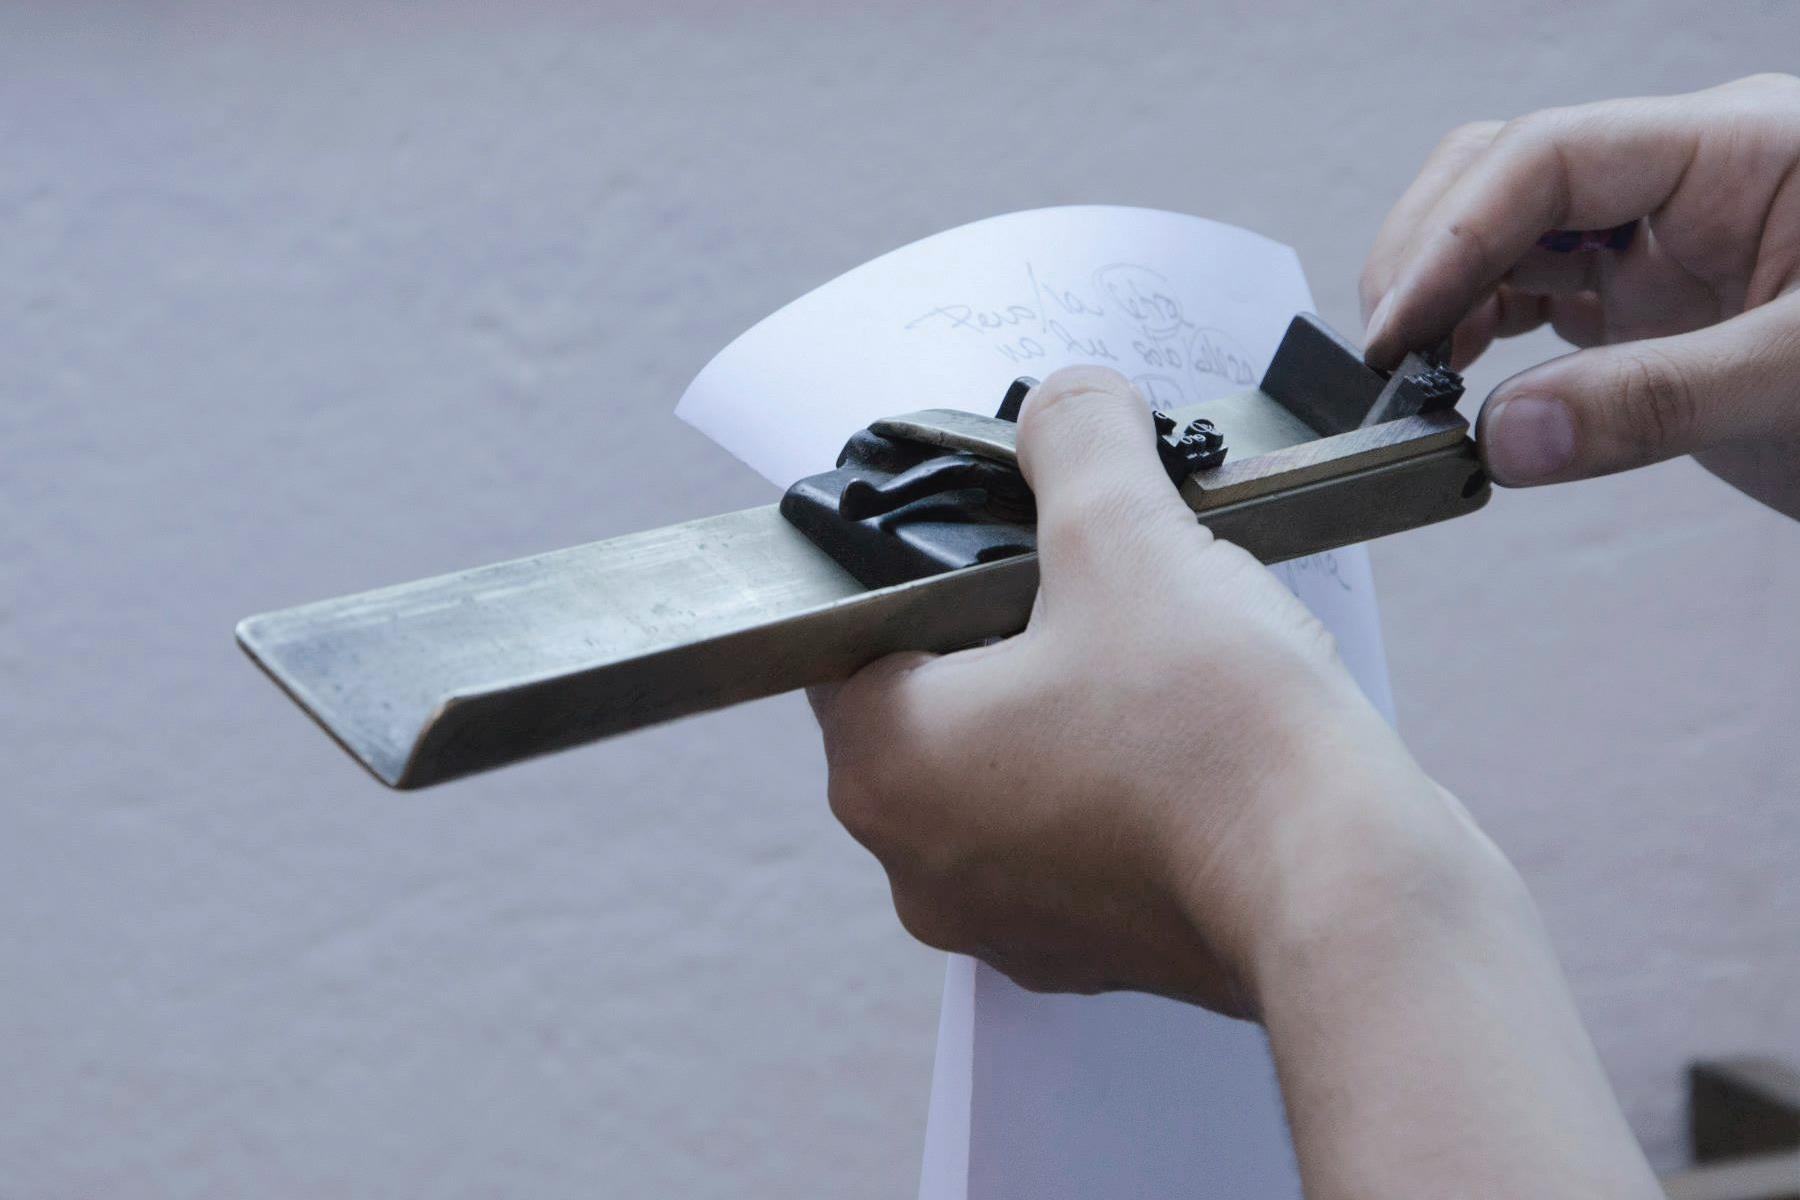 1-taller-letra-por-letra-papel-principal-letterpress-imprenta-tipografica-1.jpg